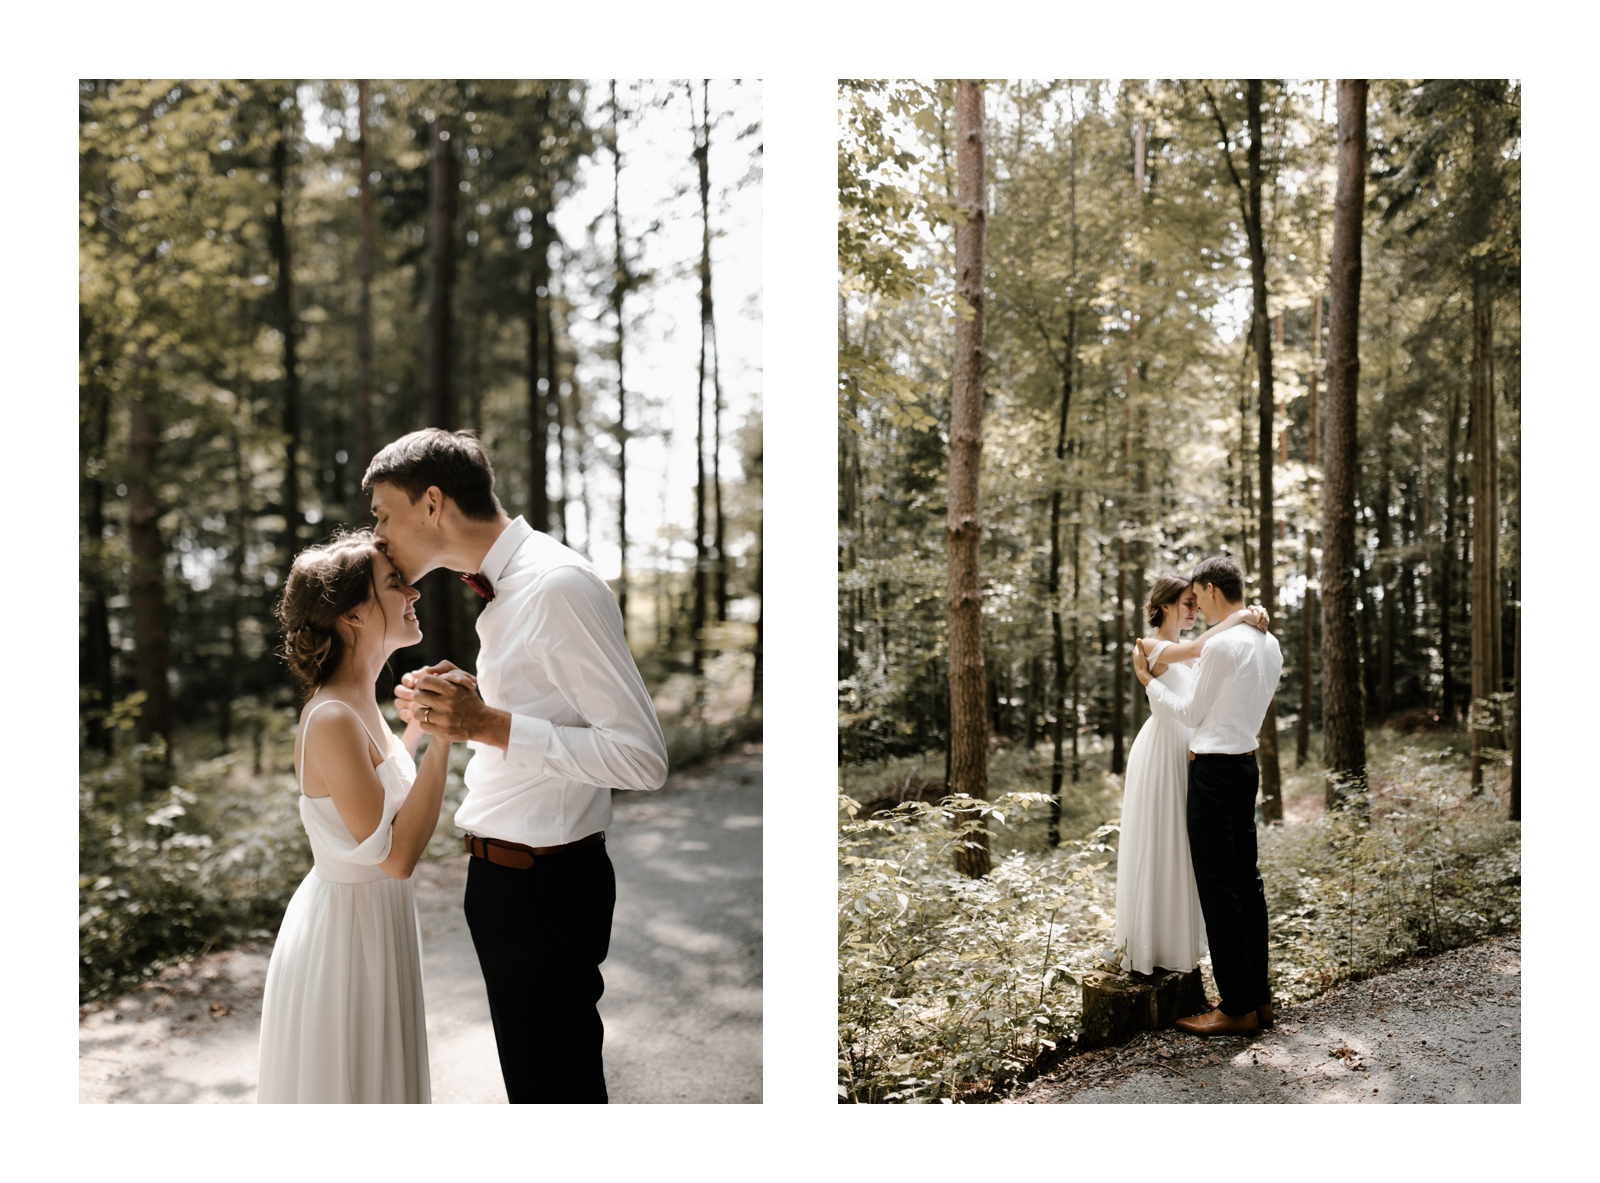 mirjam_thomas_wedding-251.jpg